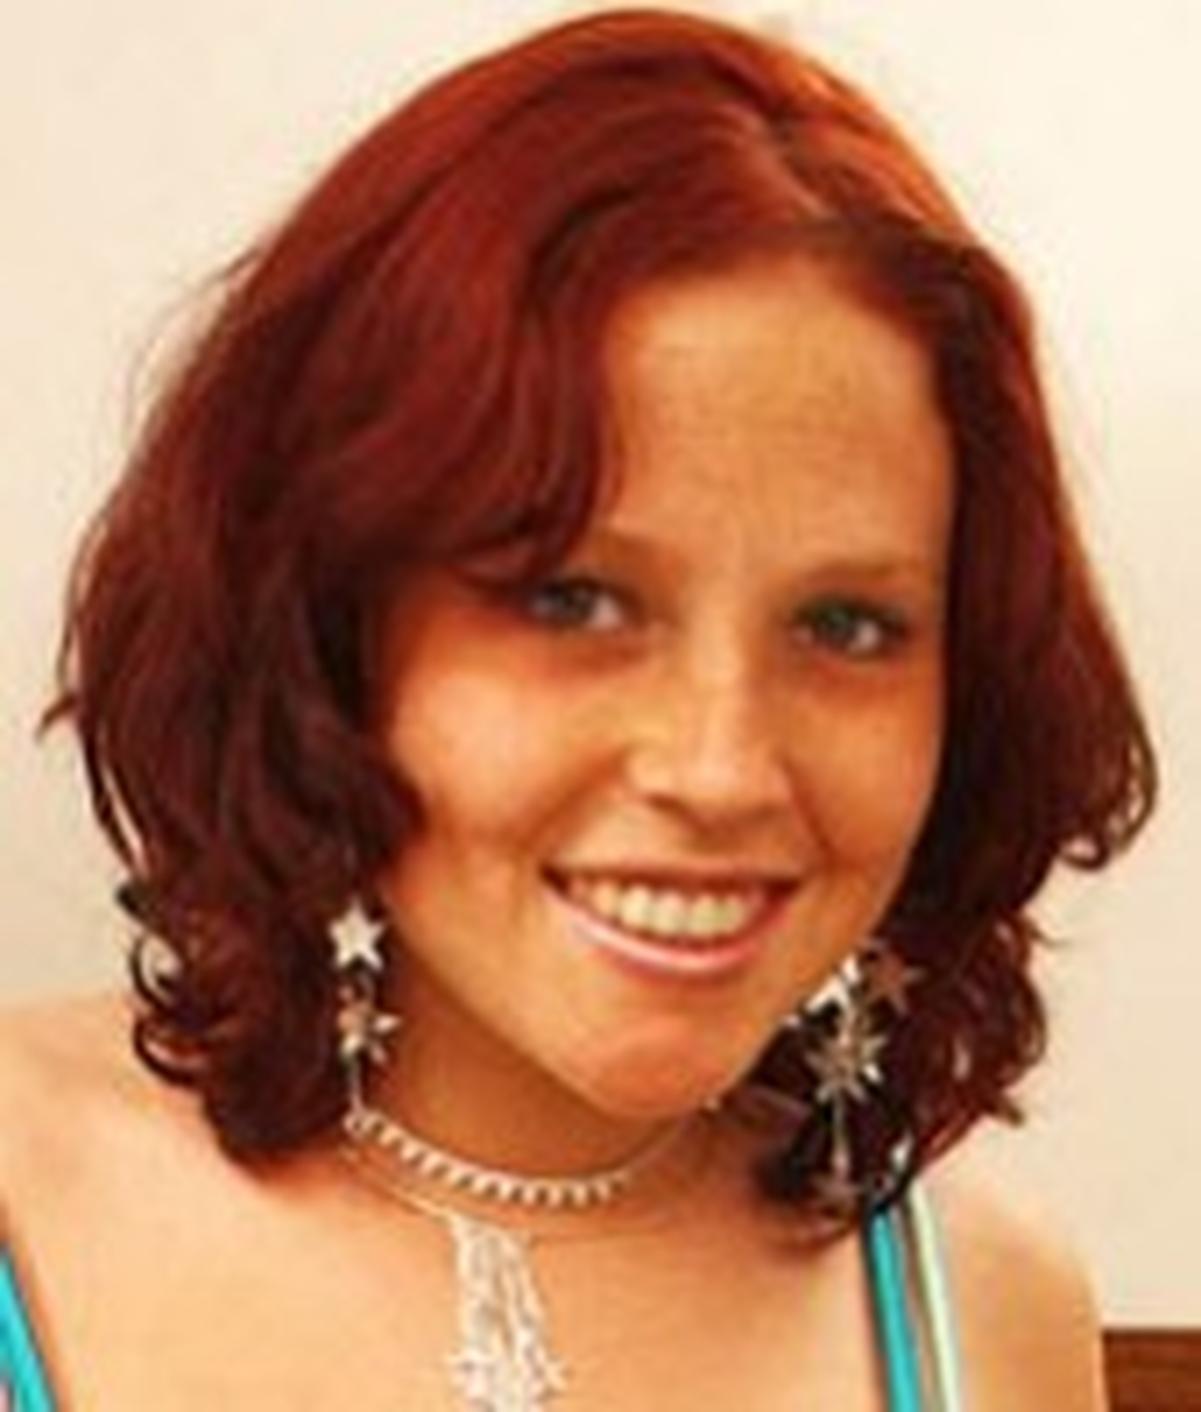 Alexis Redd wiki, Alexis Redd bio, Alexis Redd news